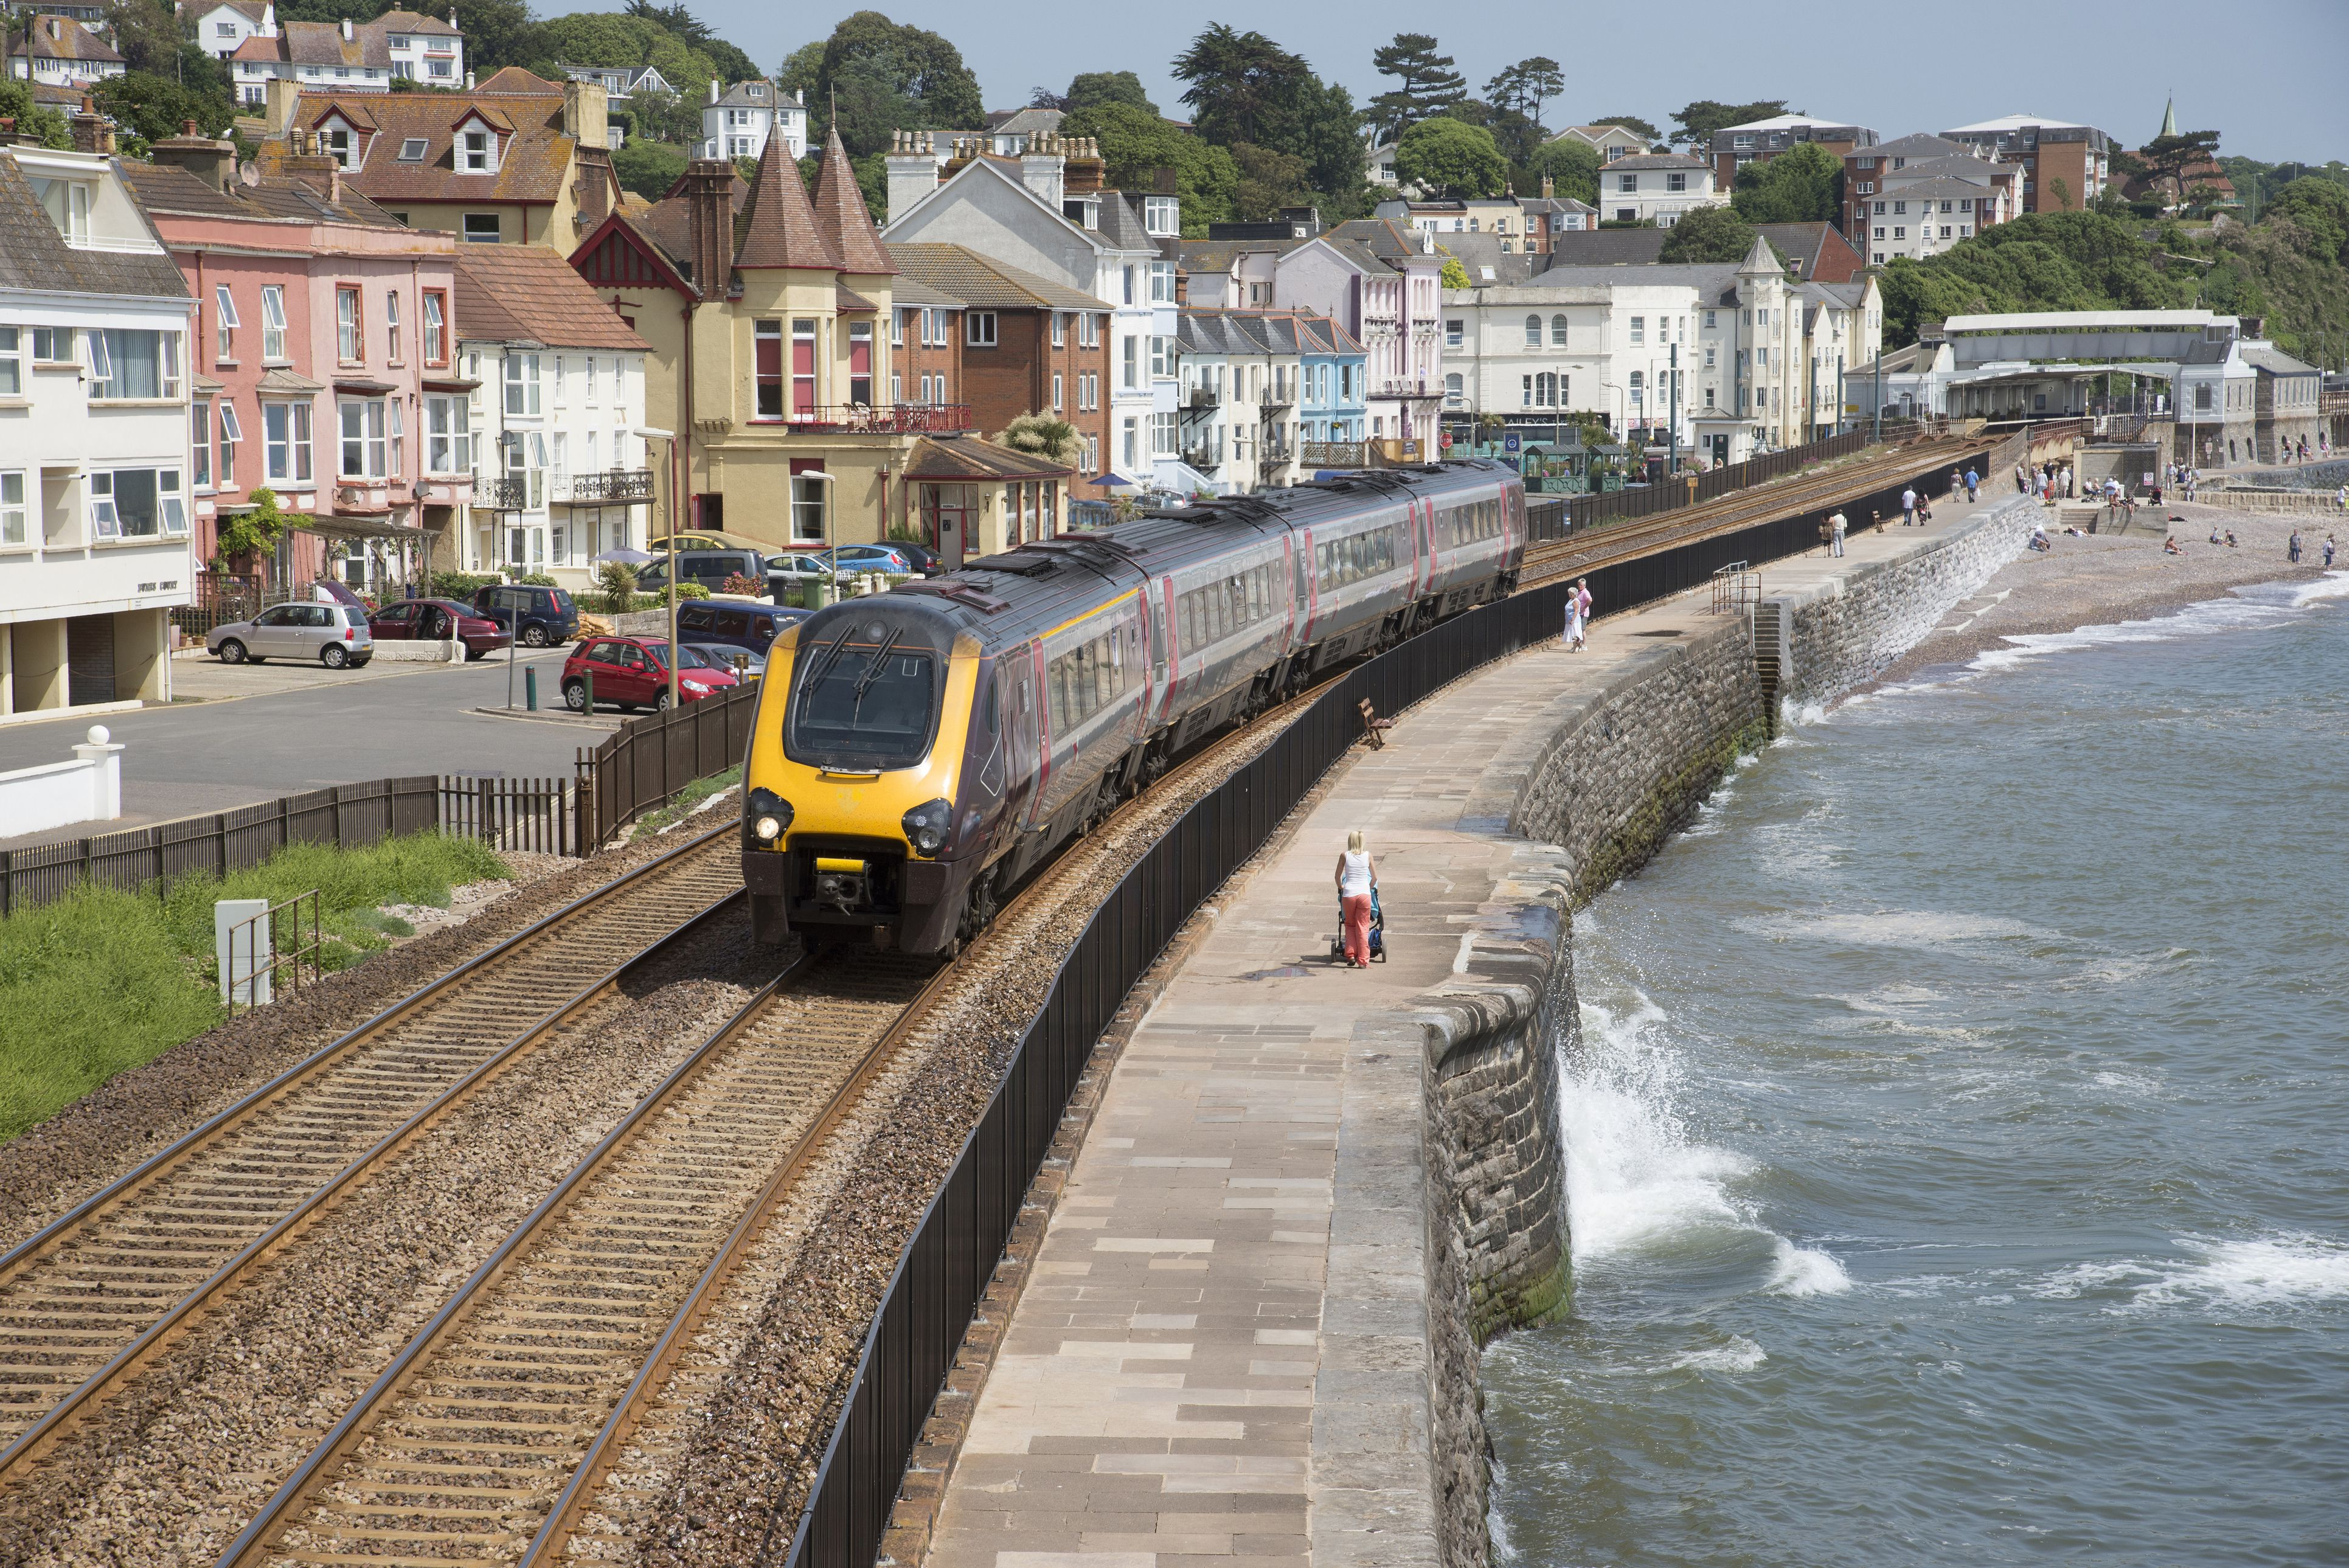 British Trains Complete Guide To British Train Travel